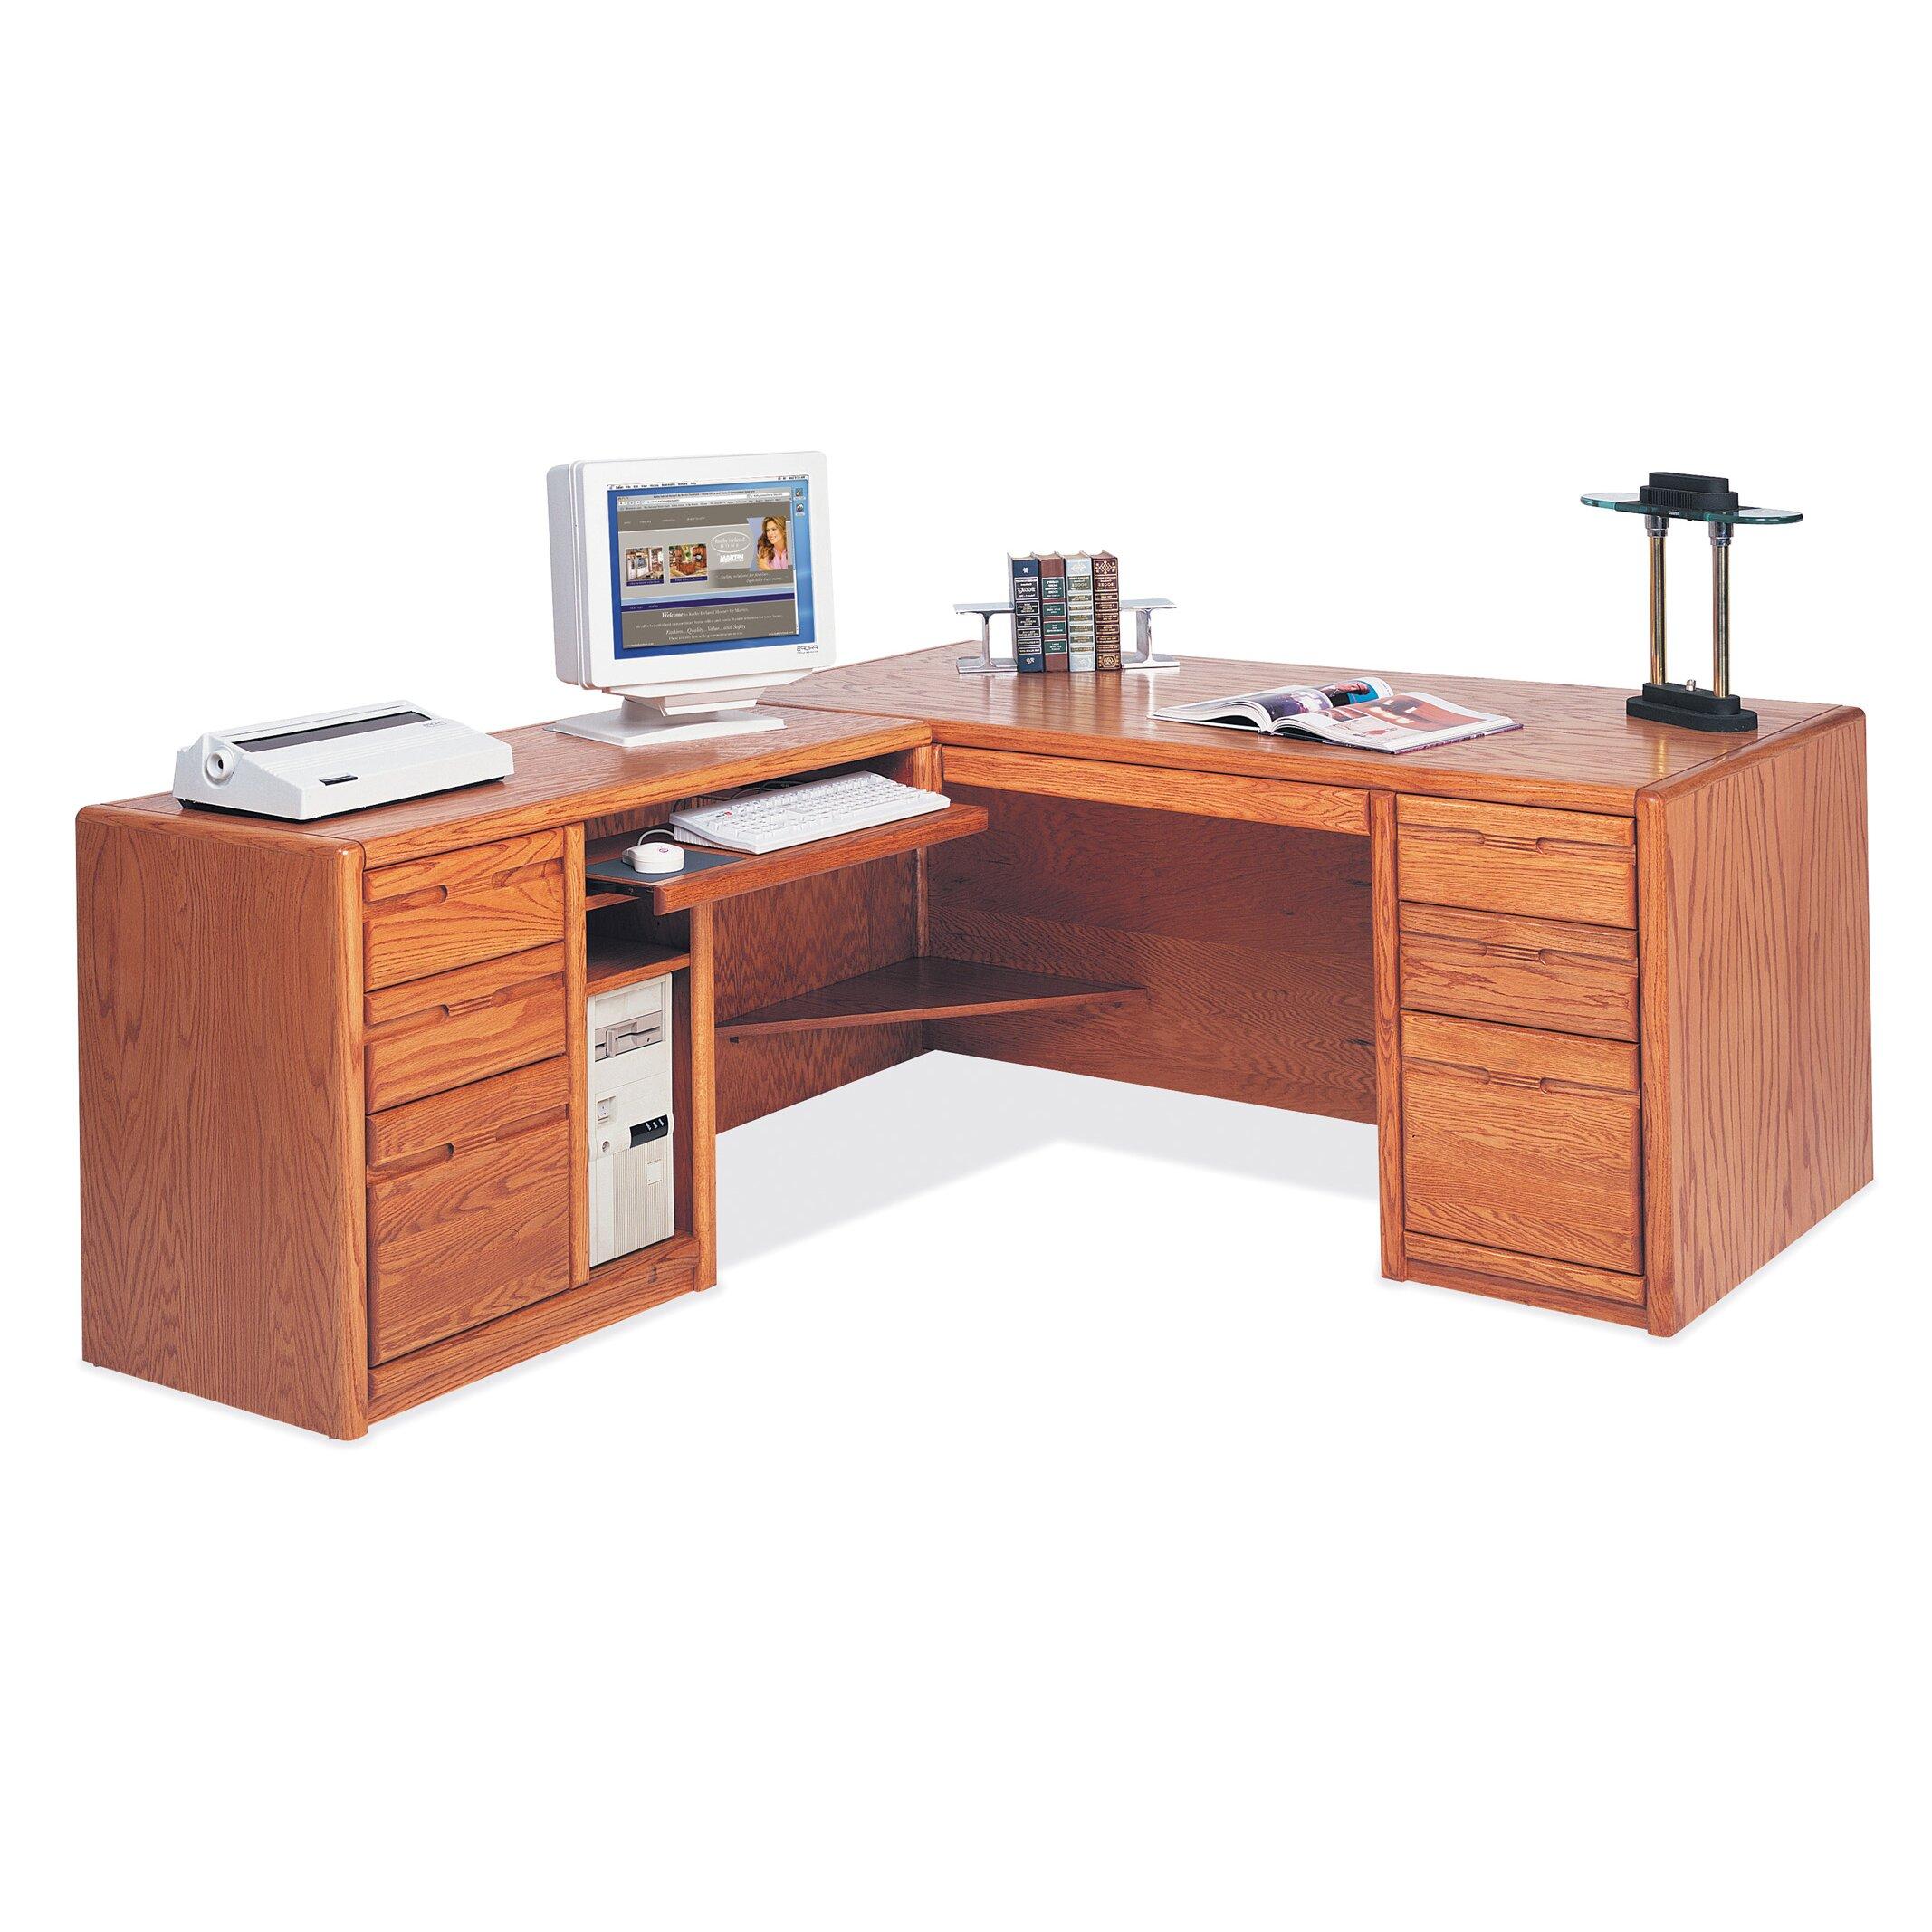 furniture office furniture executive desks martin home furnishings